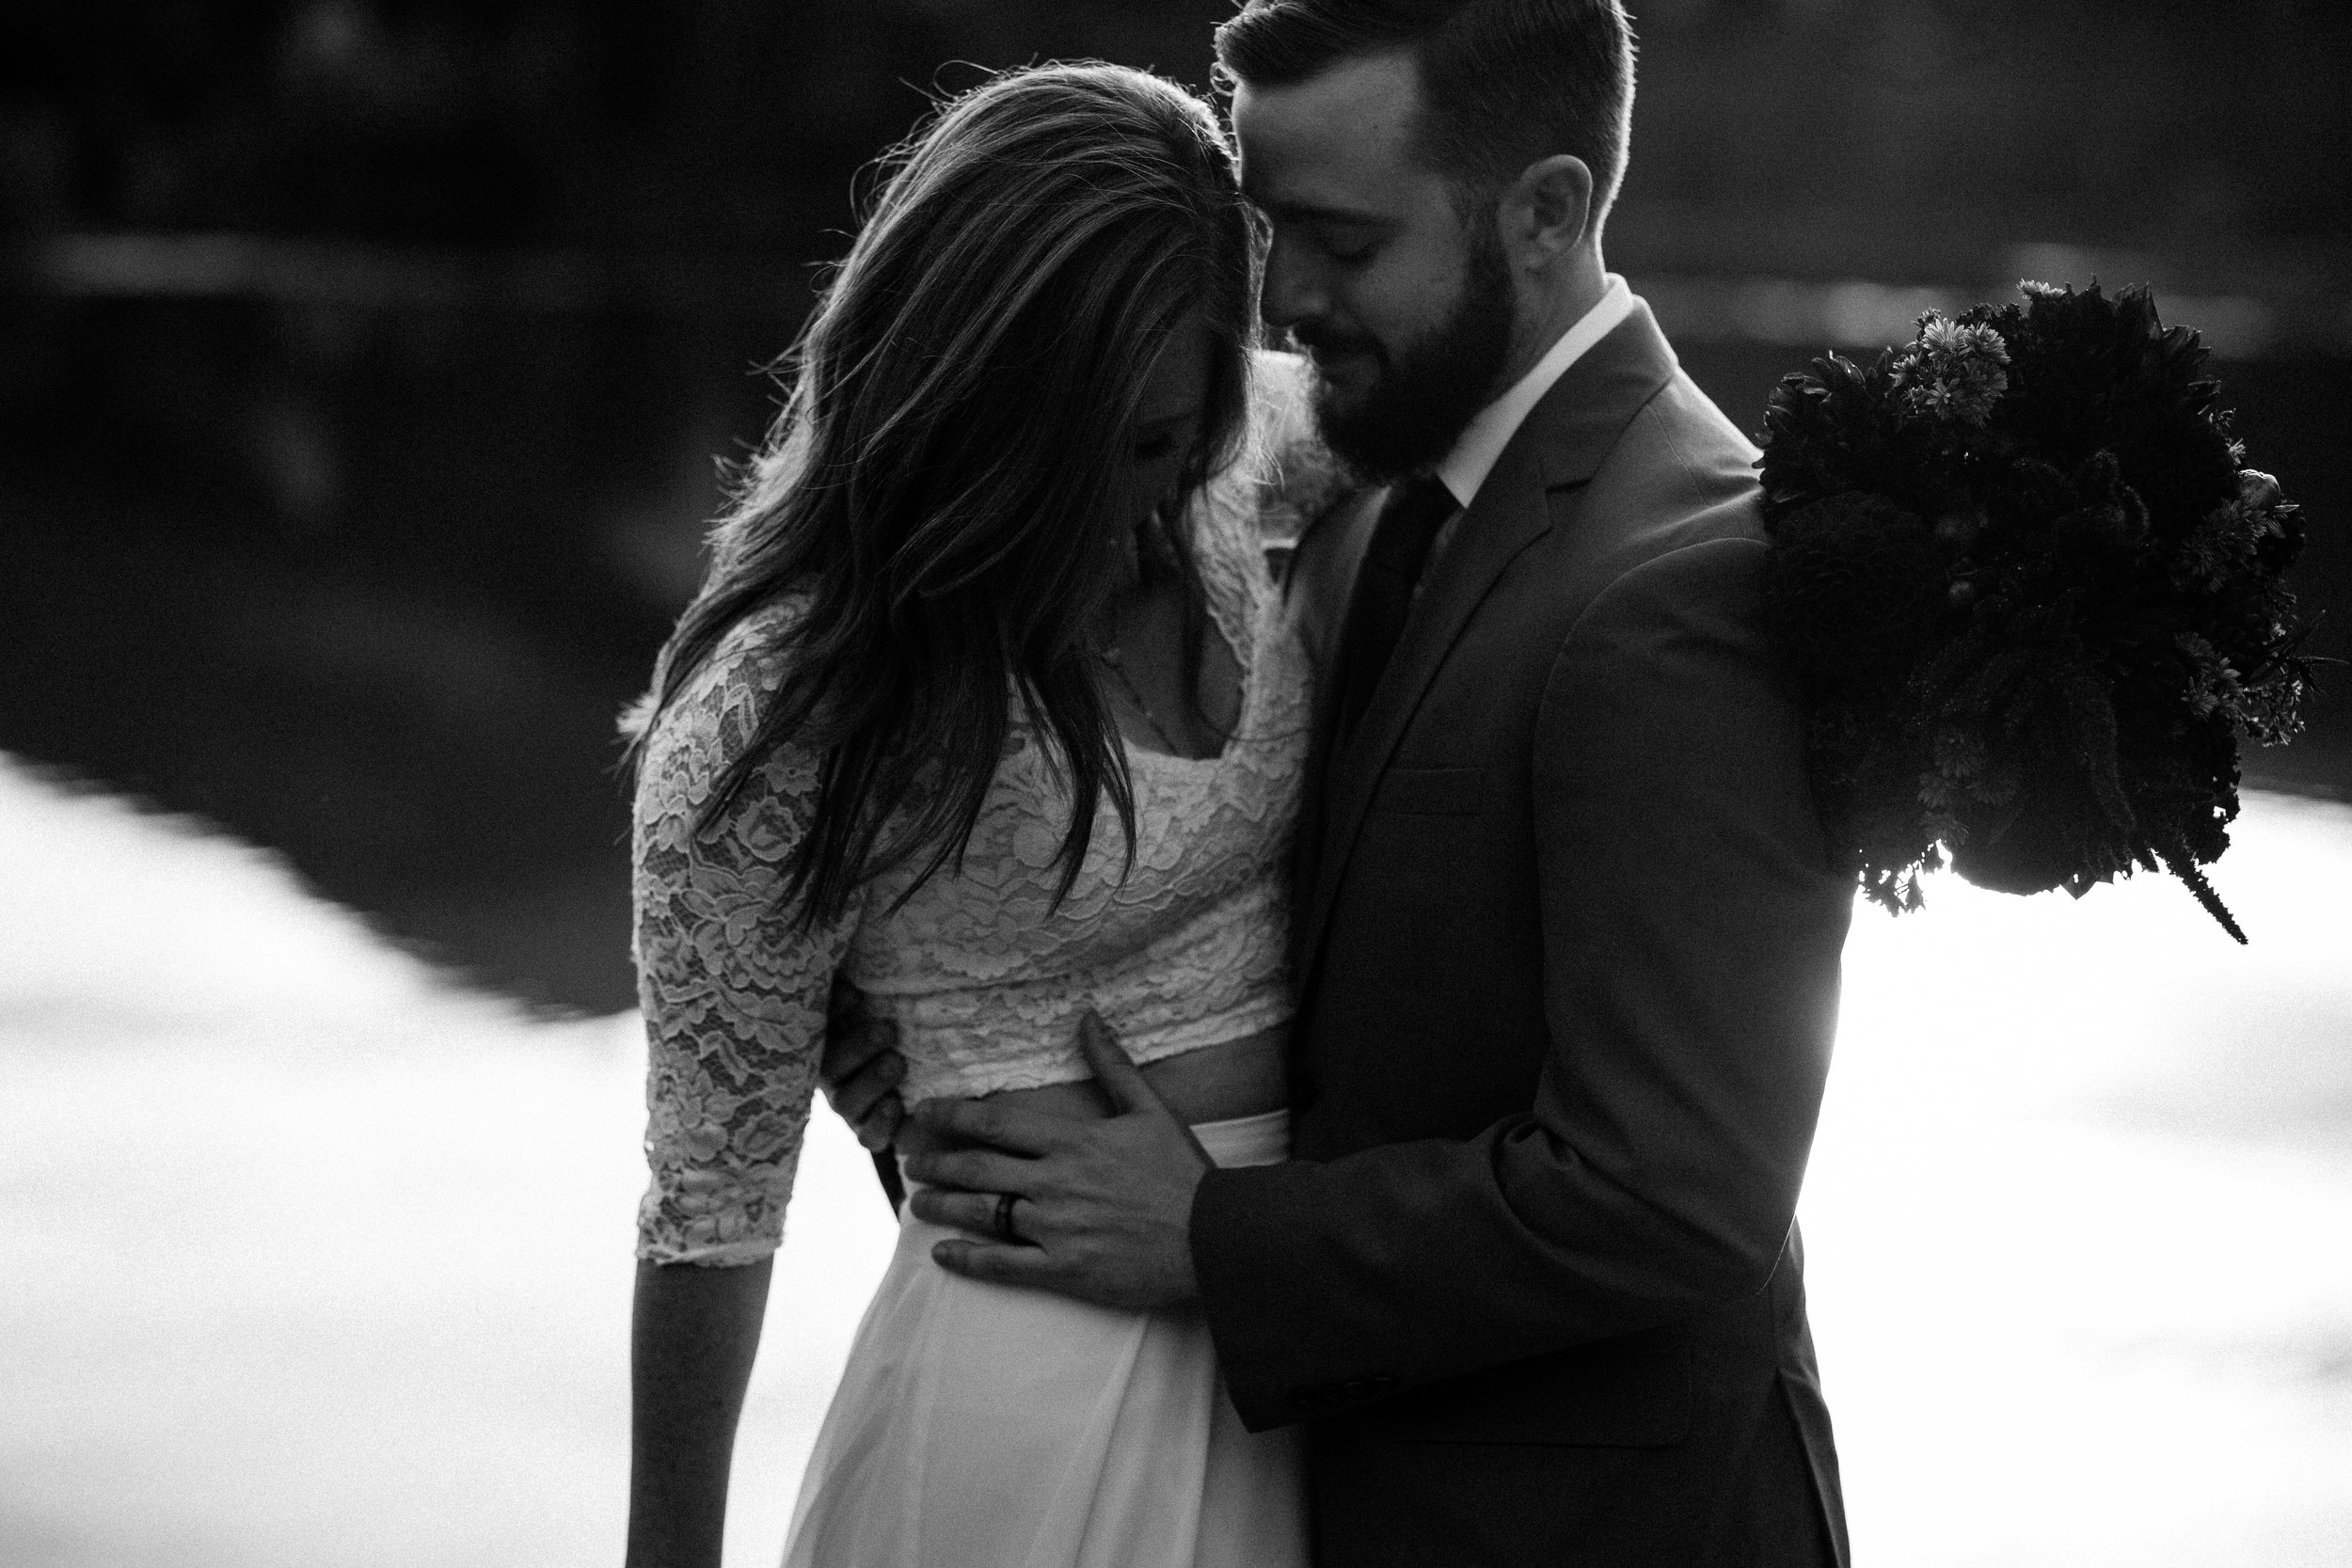 nicole-daacke-photography-mountain-view-elopement-at-gold-creek-pond-snoqualmie-washington-wa-elopement-photographer-photography-adventure-elopement-in-washington-fall-lakeside-golden-sunset-boho-fun-bride-2753.jpg